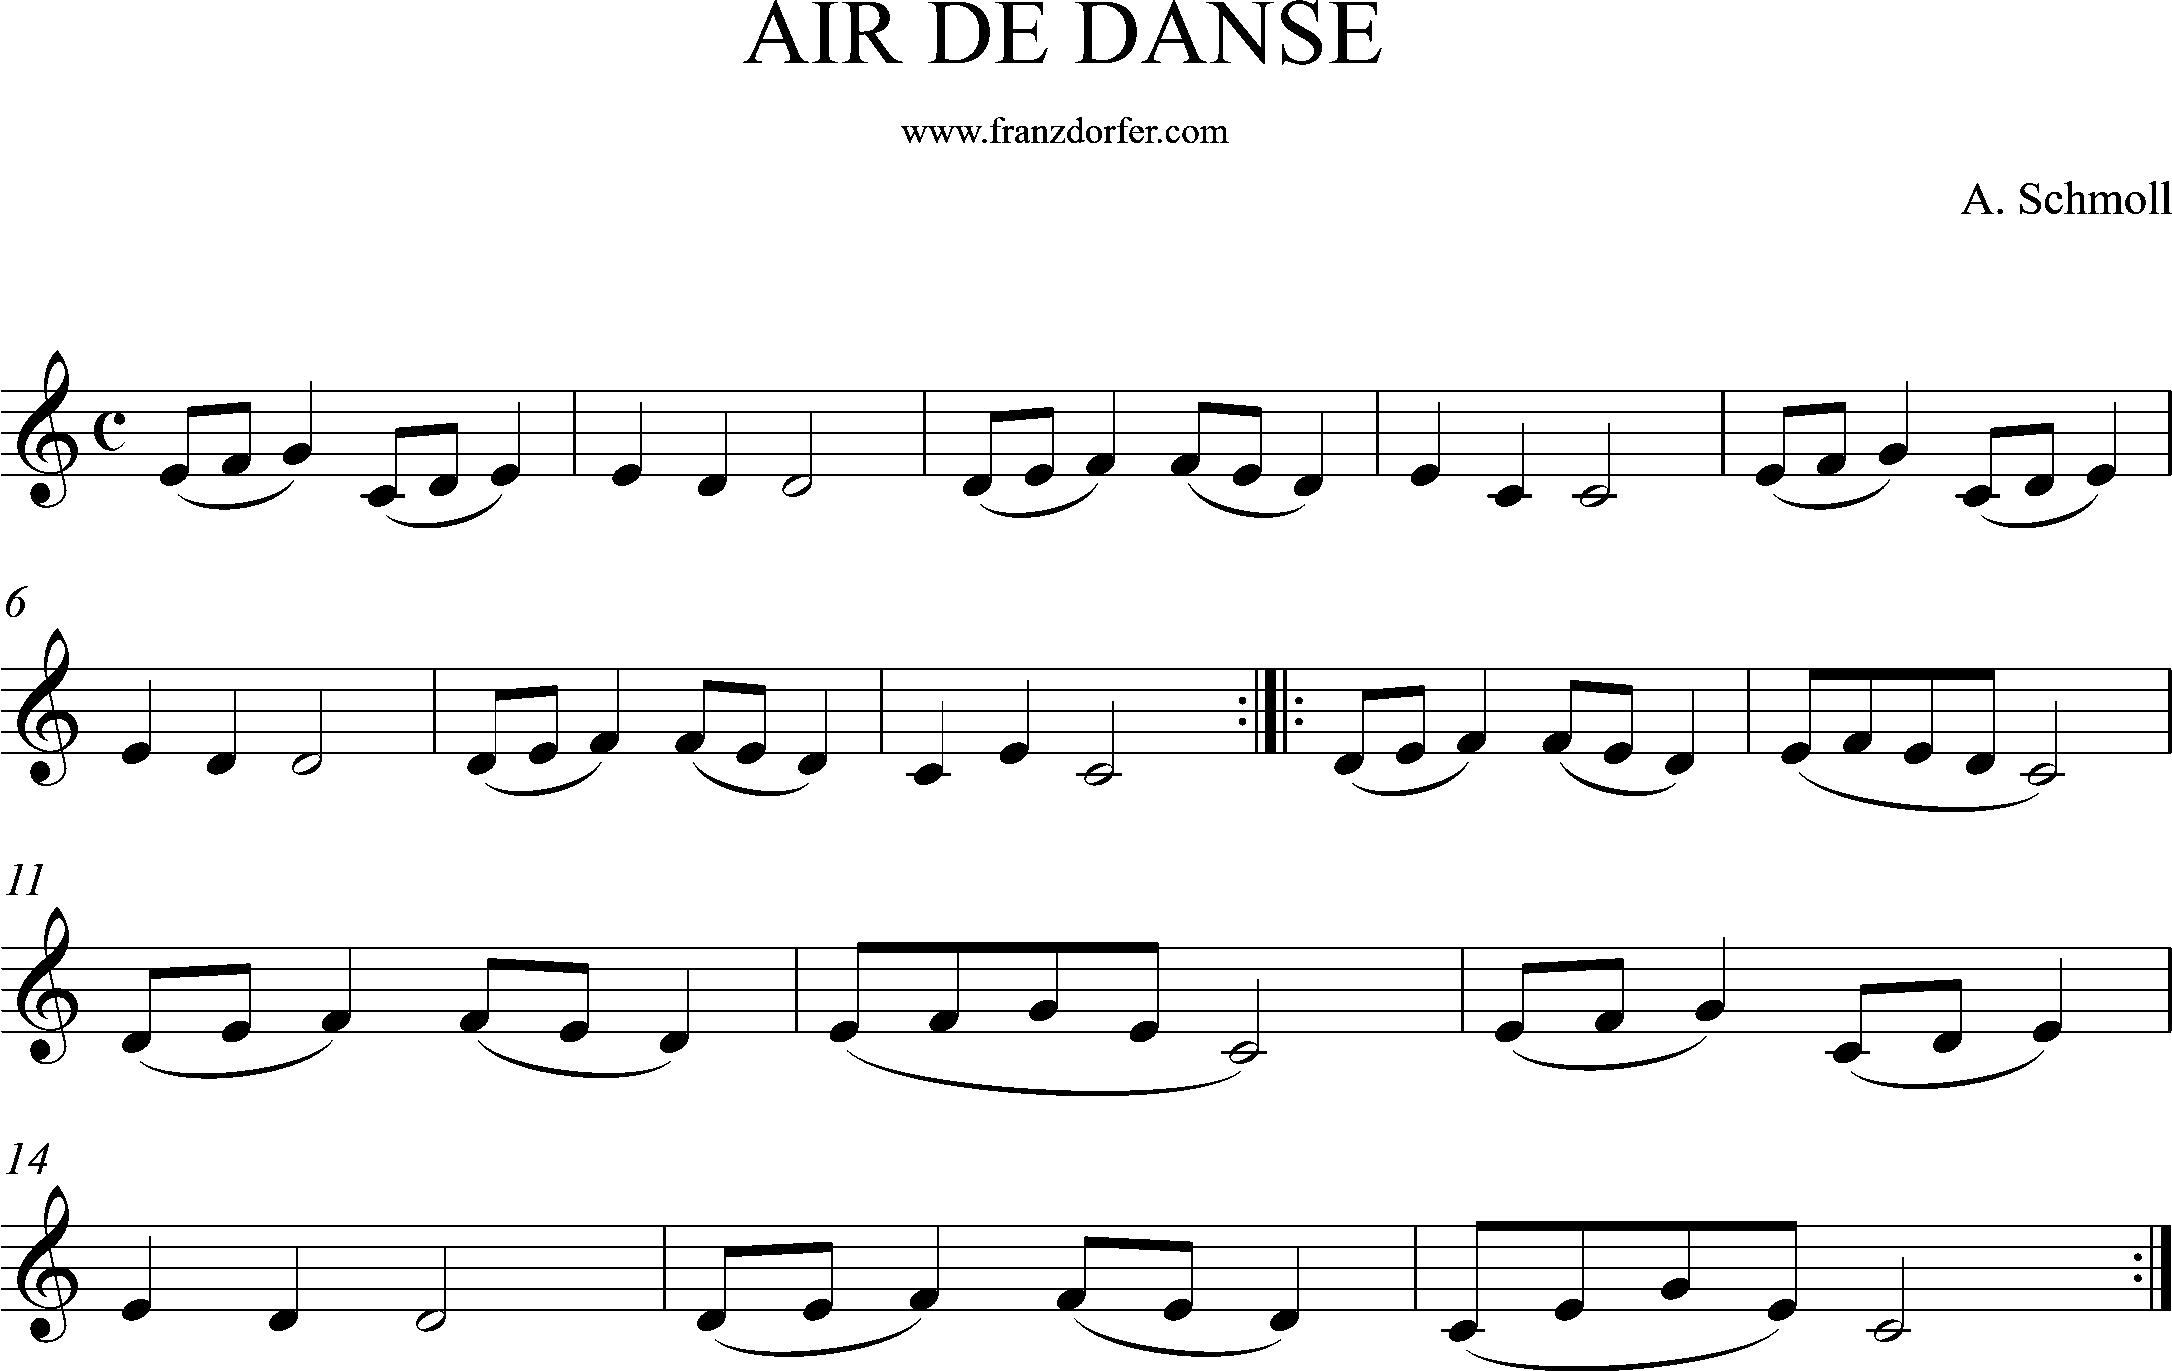 Clarinet, sheetmusic, Air de Danse, Schmoll